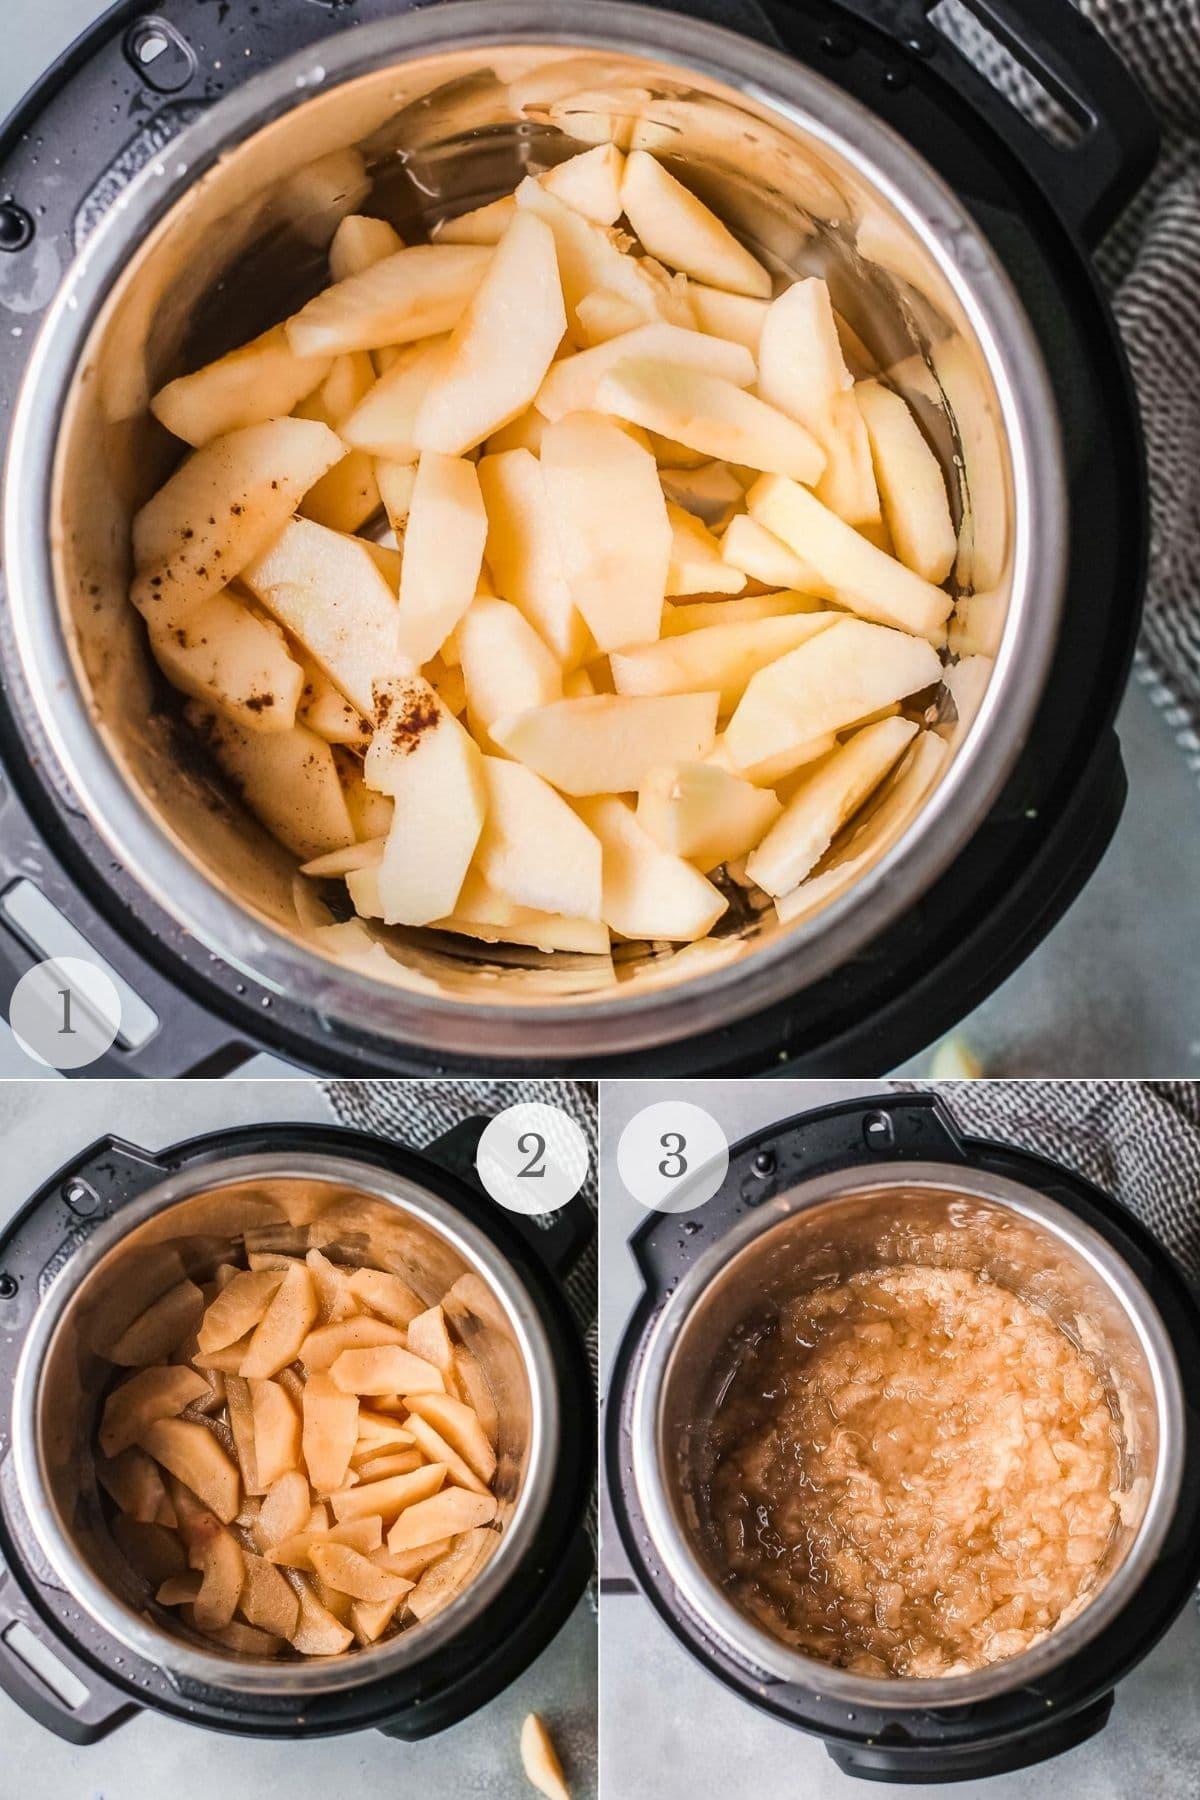 instant pot applesauce recipe steps 1-3